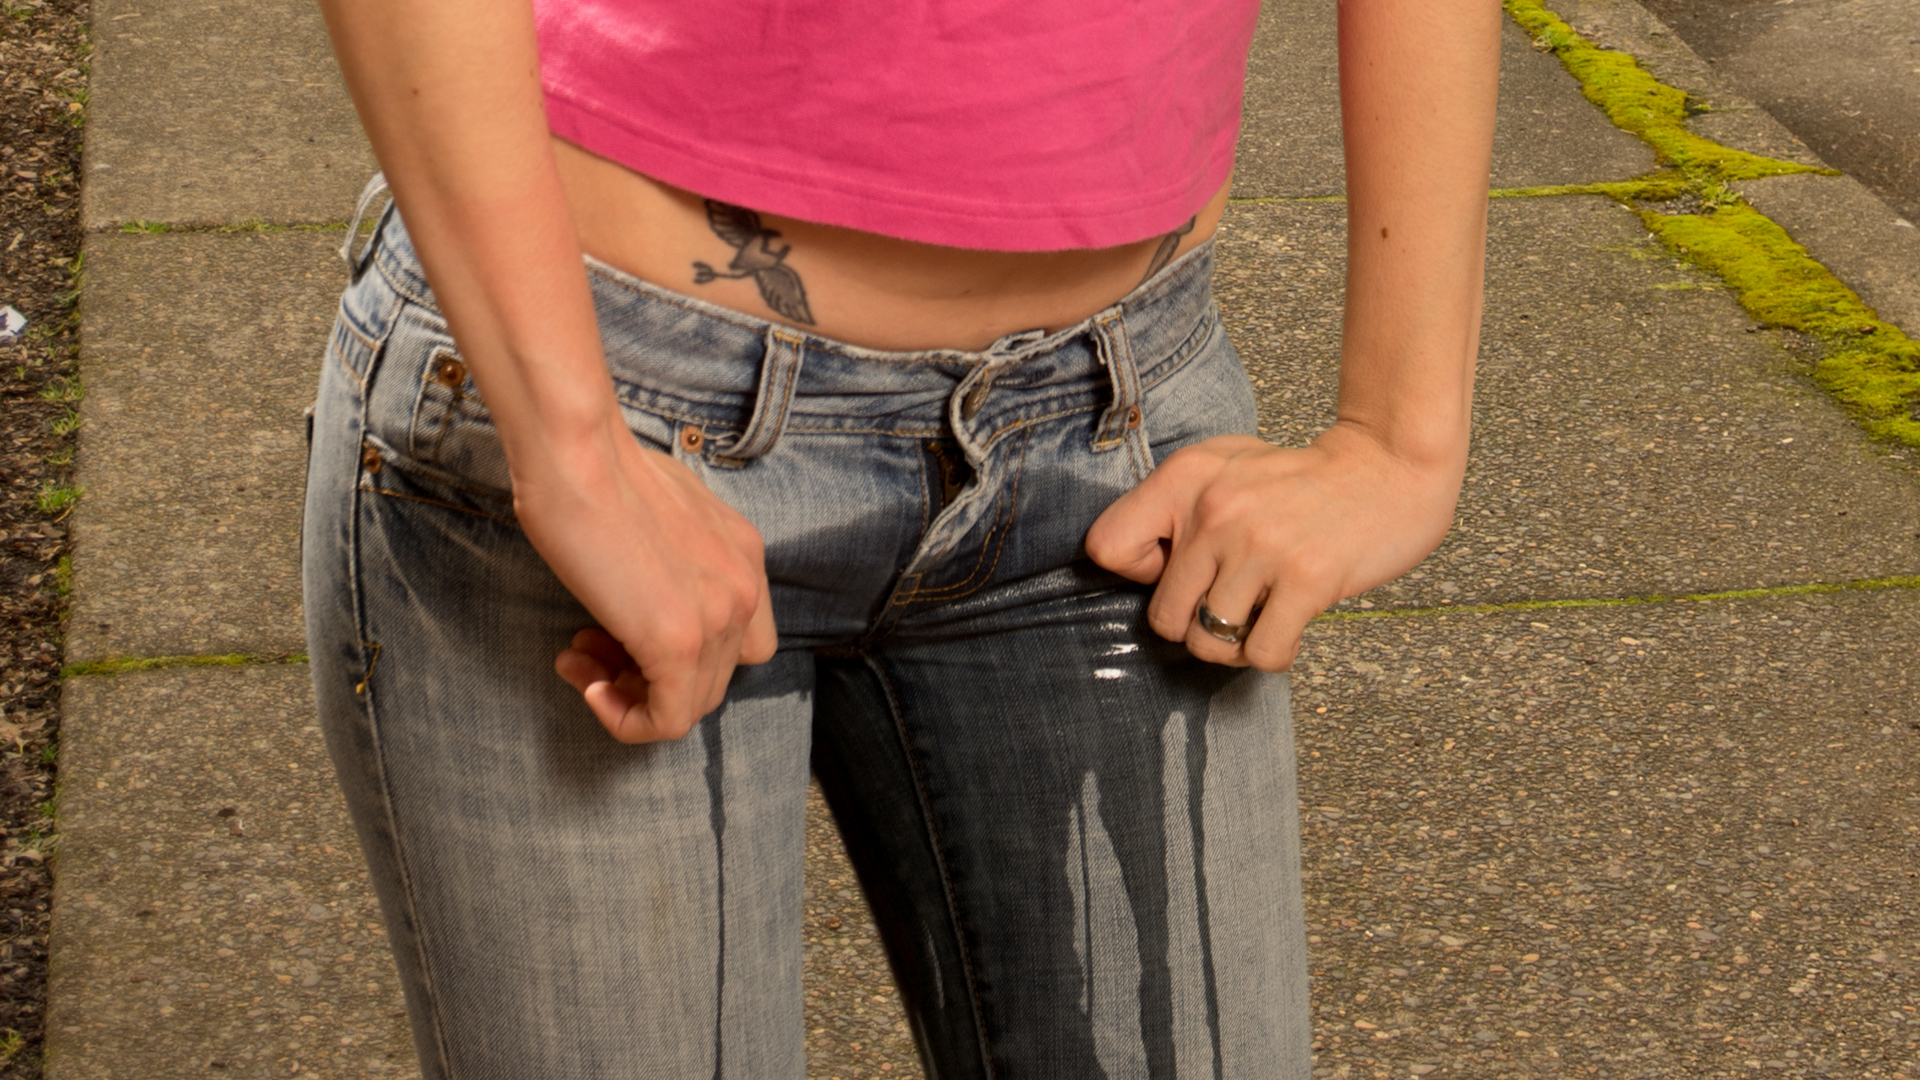 Писсинг через джинсы #9